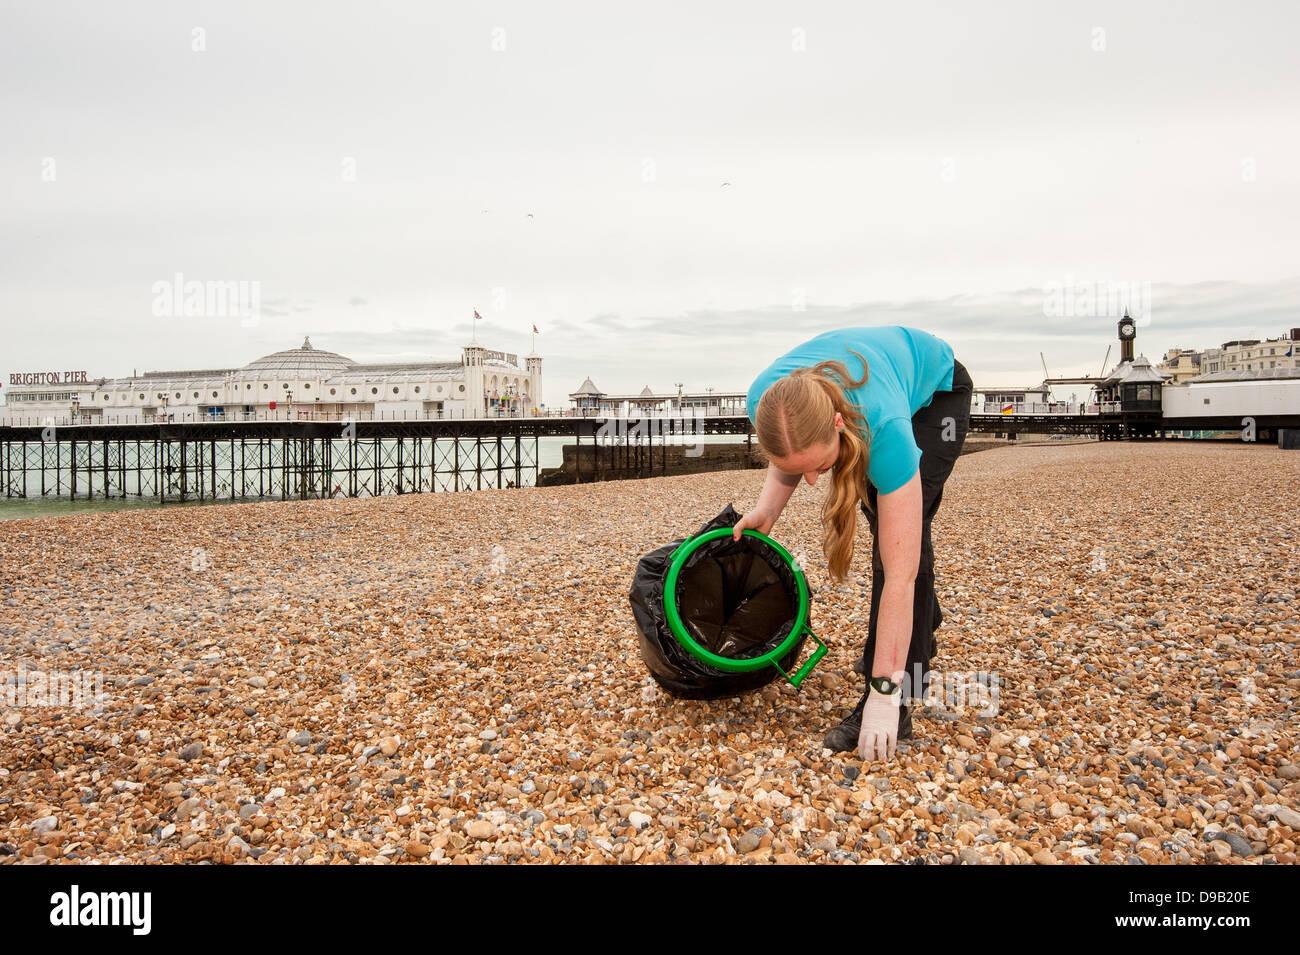 Brighton, UK. 17th June, 2013. Carey Duckworth, curator at  Brighton SeaLife Centre protecting the environment, - Stock Image